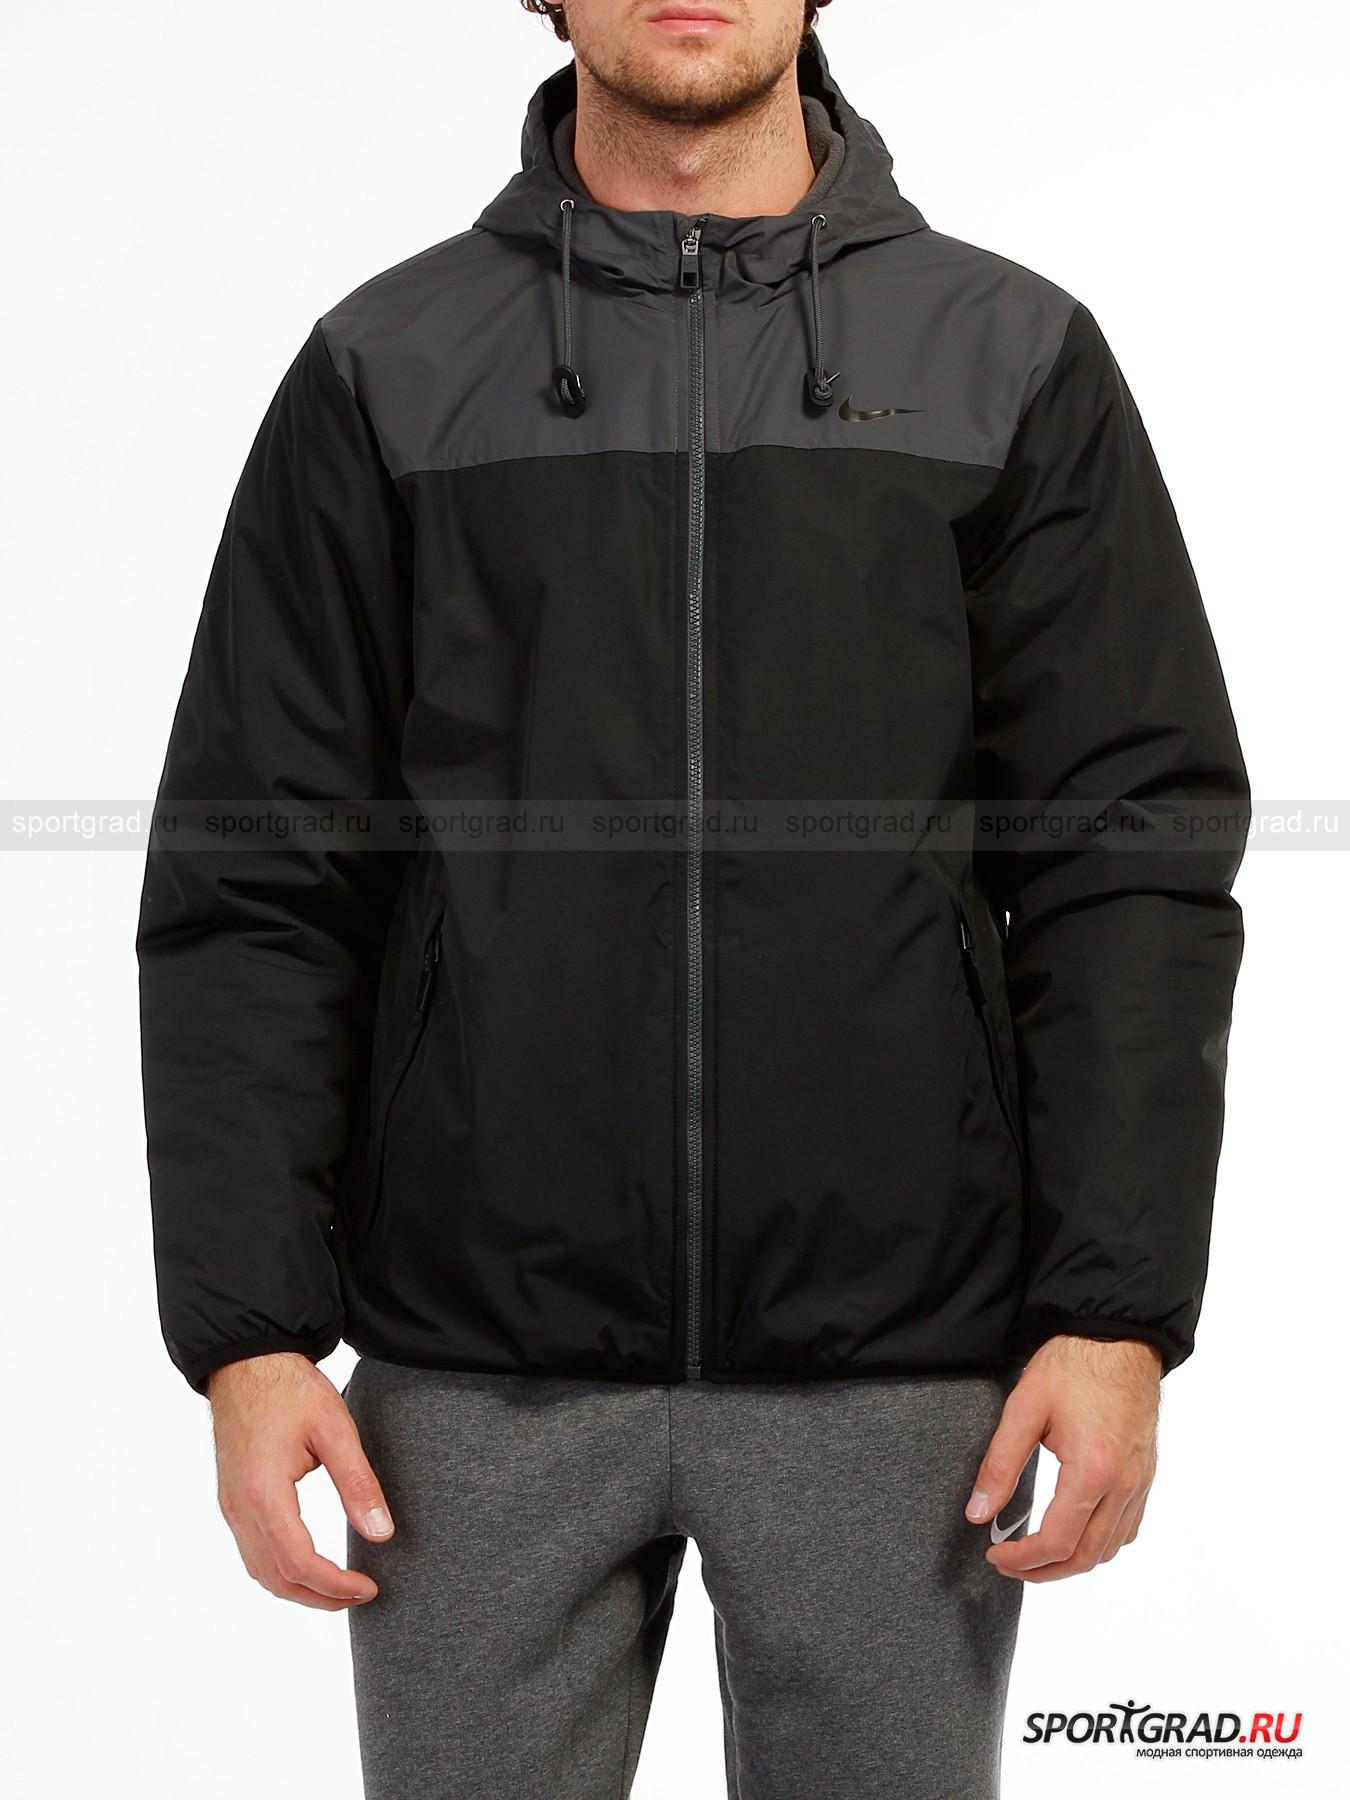 Куртка мужская флис FLEECE LINED JACKET NIKE